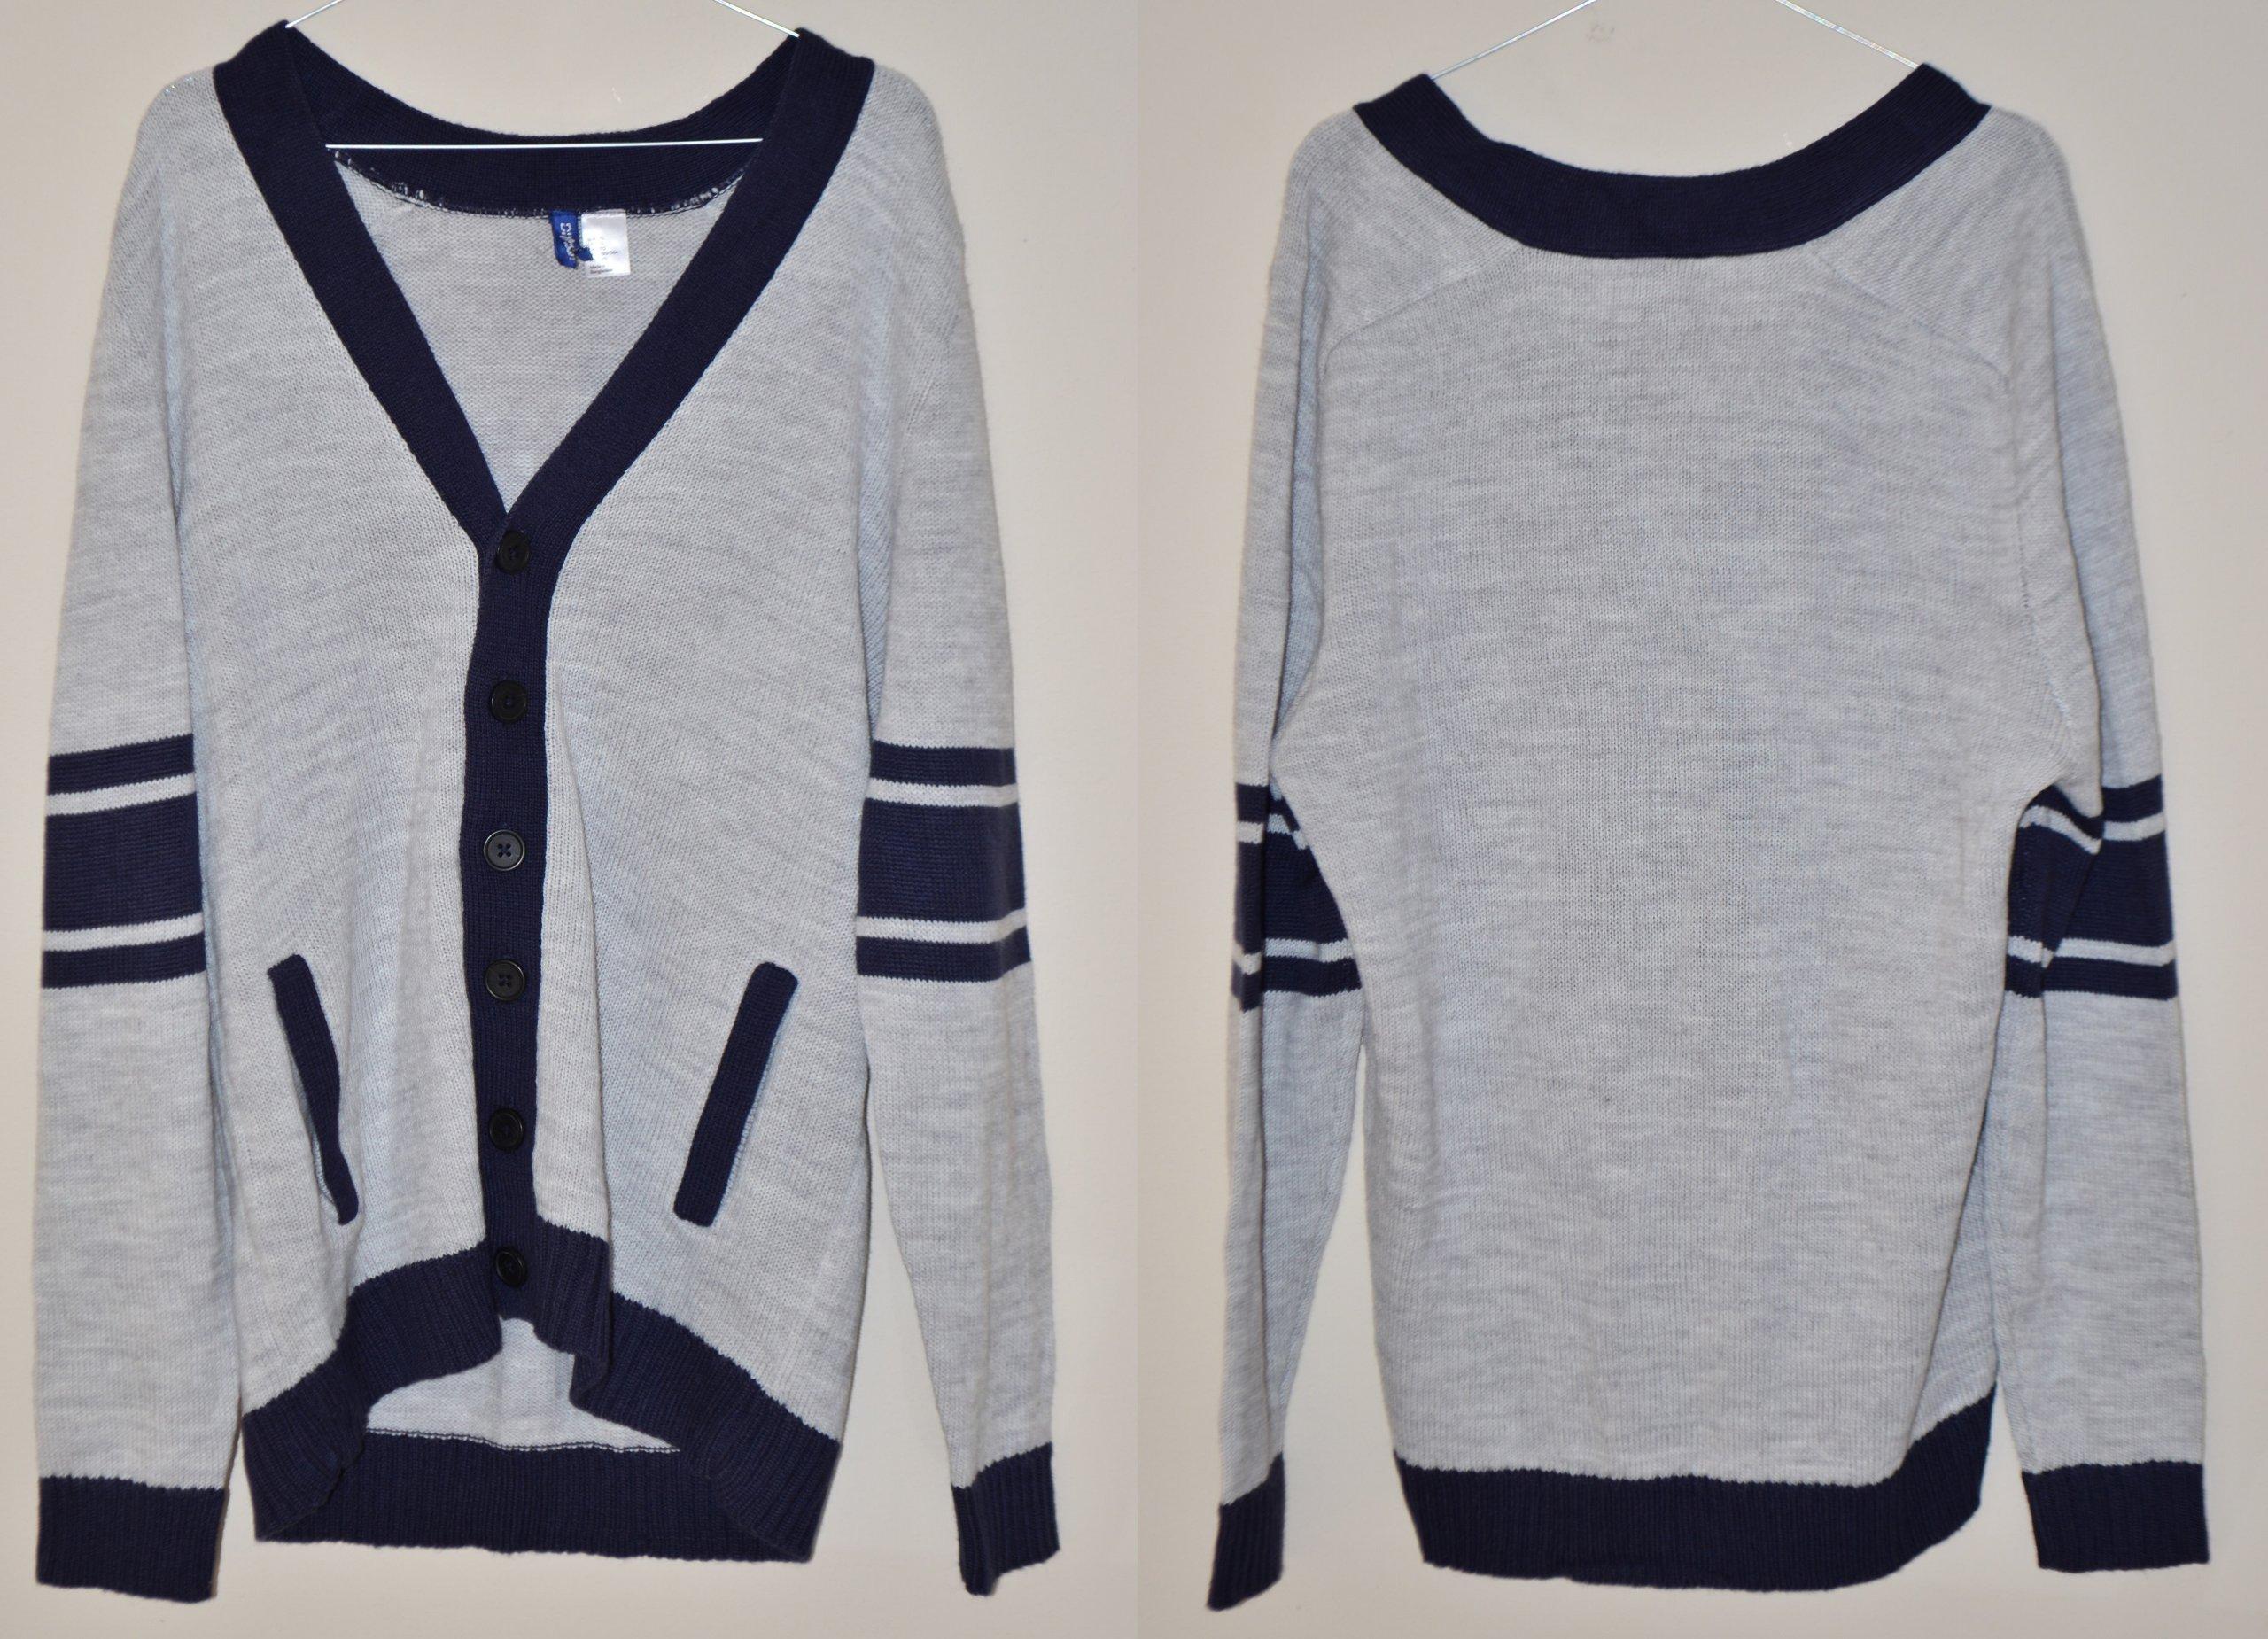 474 H&M SWETER SEREK MĘSKI GUZIKI SZARY XL